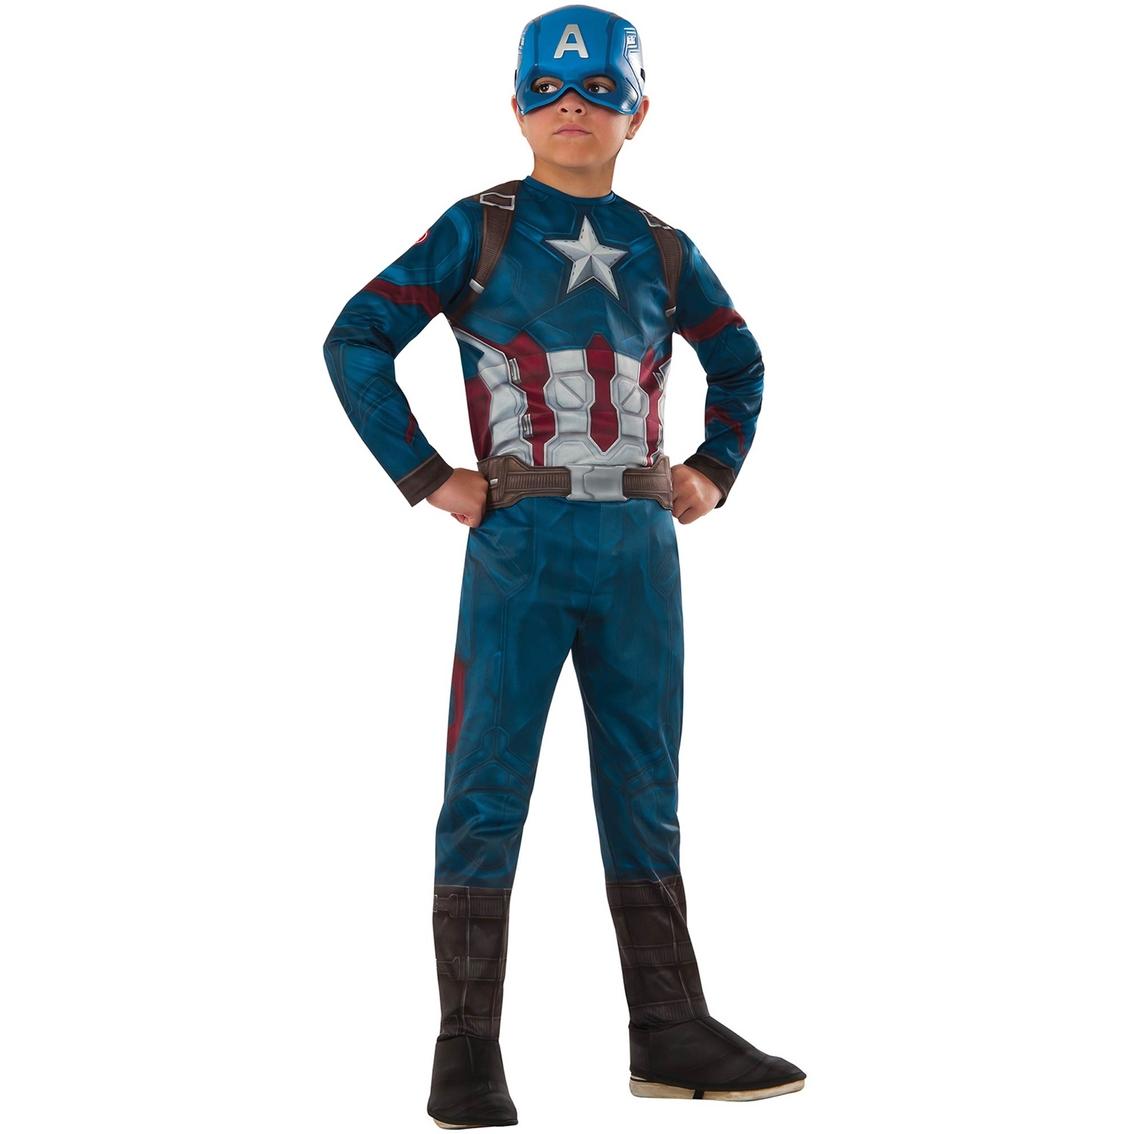 Rubie S Costume Little Boys Boys Marvel S Captain America Civil War Costume Children S Costumes Baby Toys Shop The Exchange New captain marvel carol danvers cosplay costume mp004141. exchange